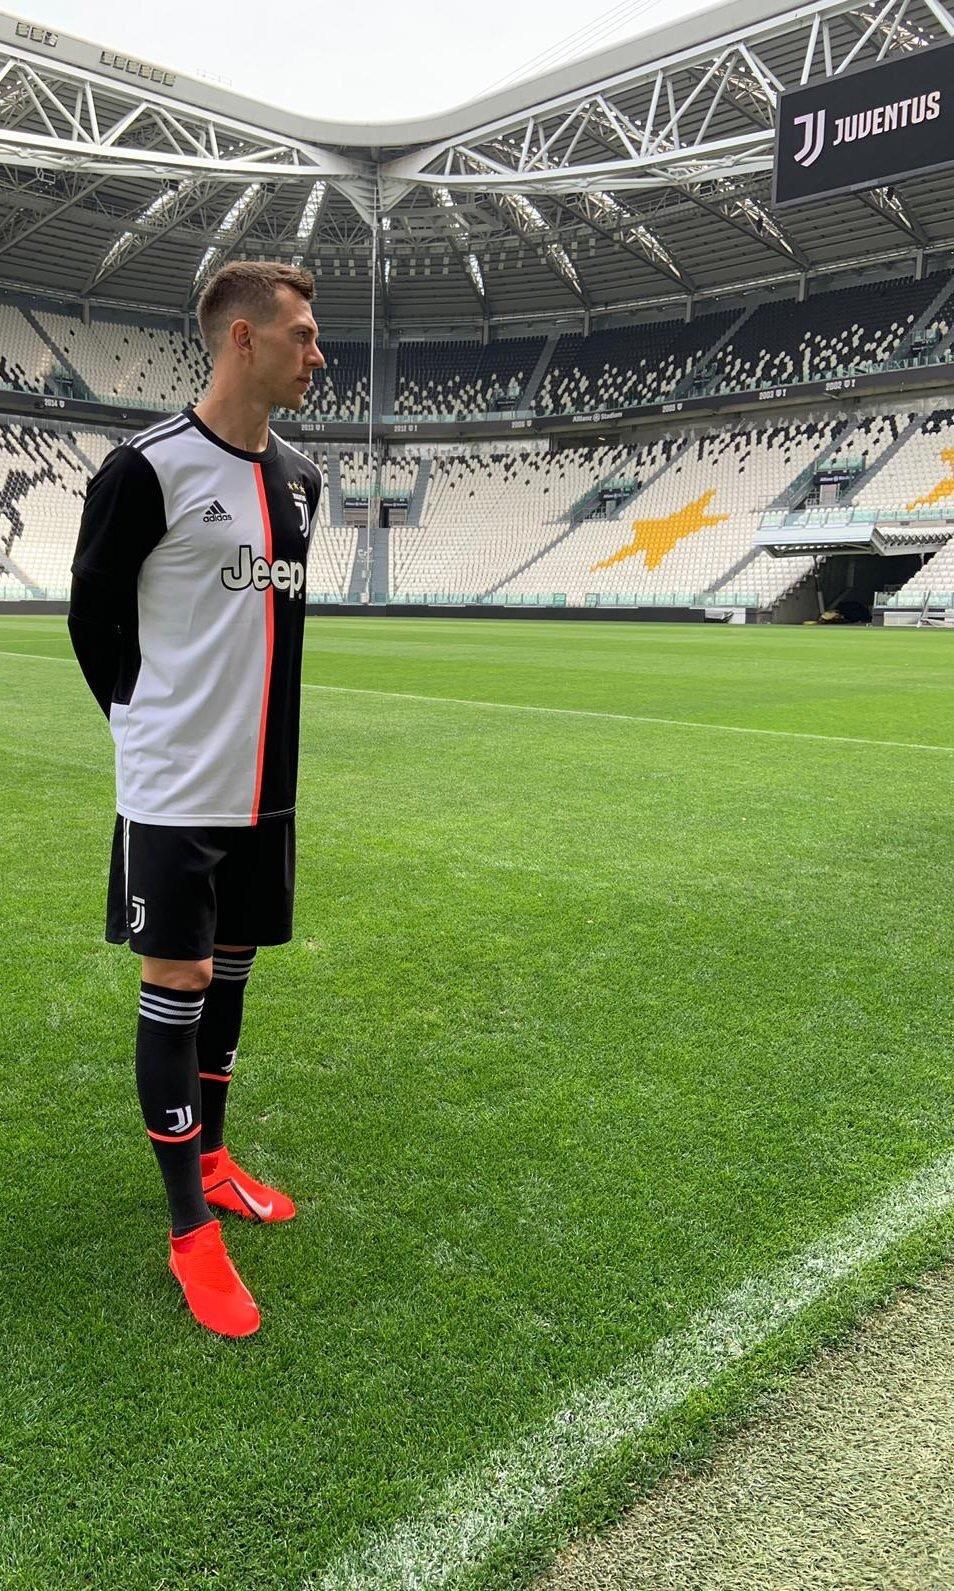 34f5aeccd Juventus 2019-20 Home Kit Leaked